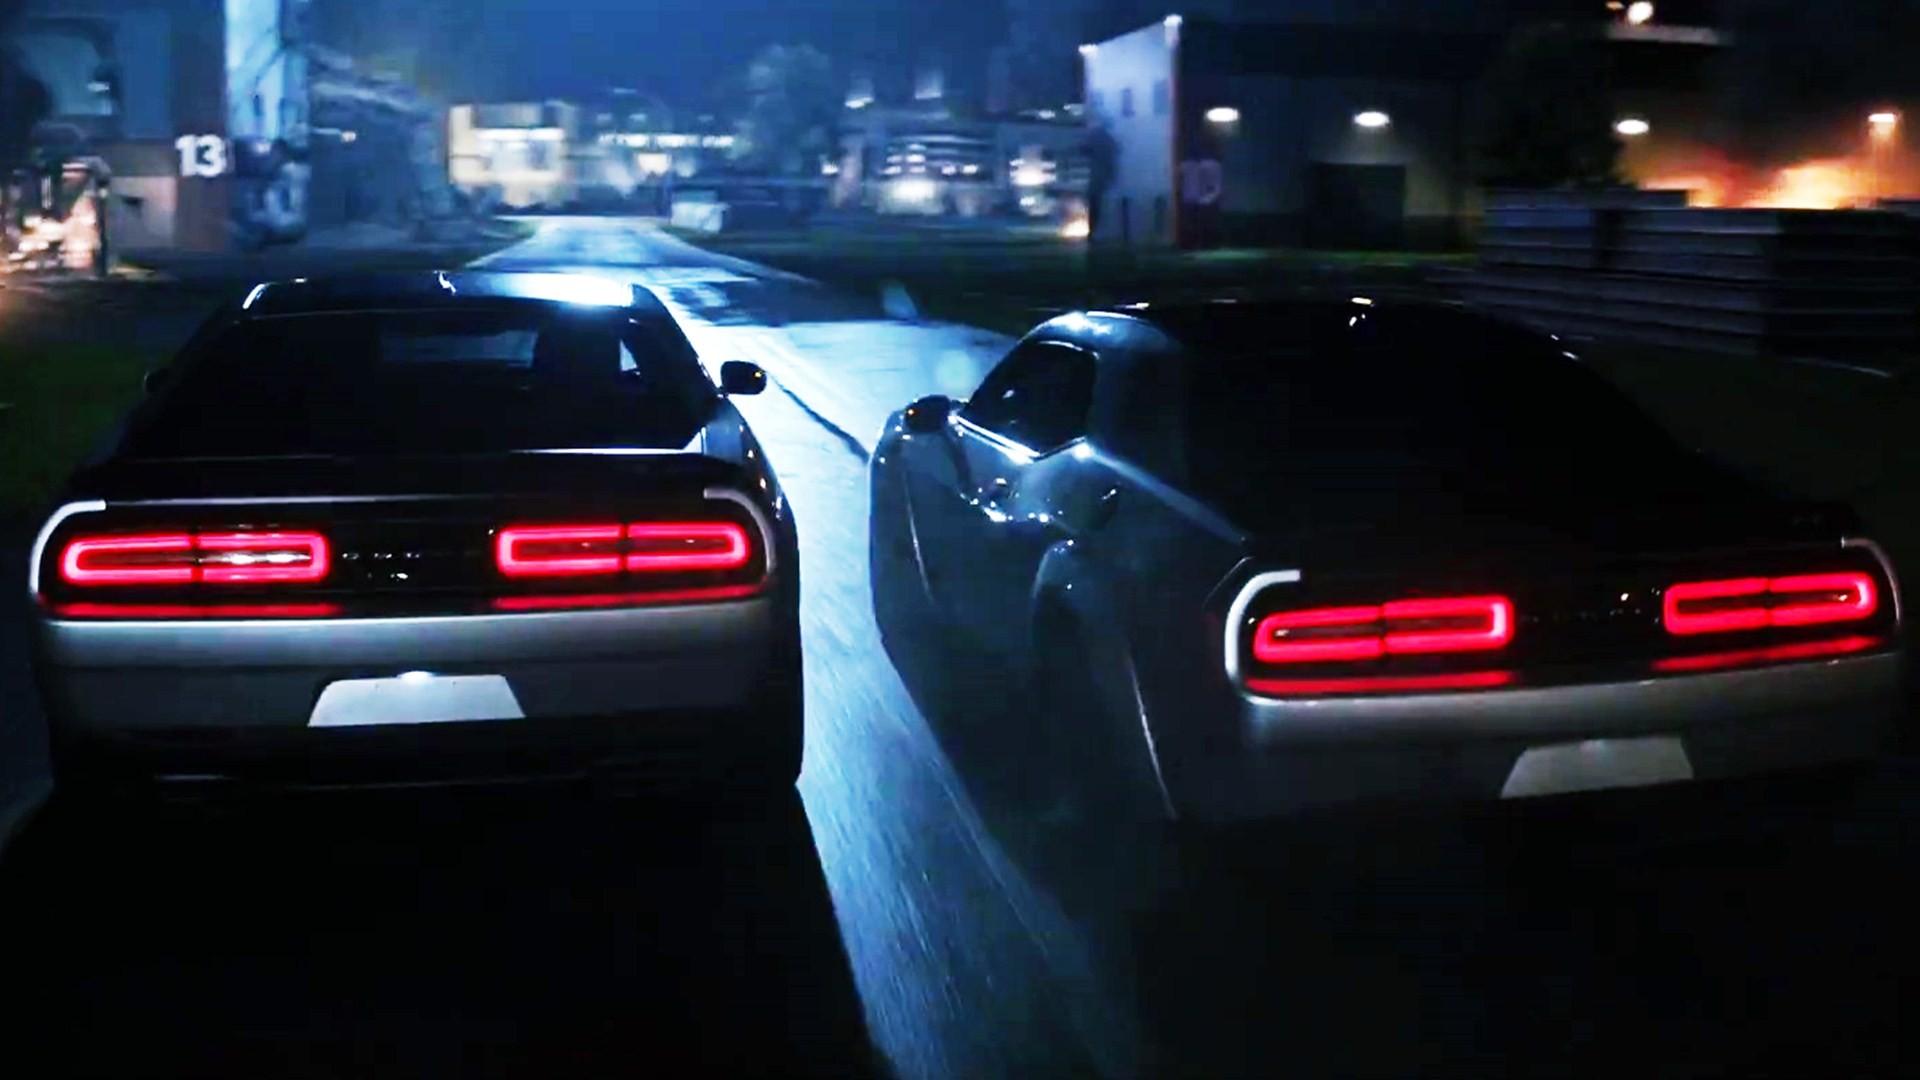 Fast & Furious 8 Car Racing Wallpaper 11762